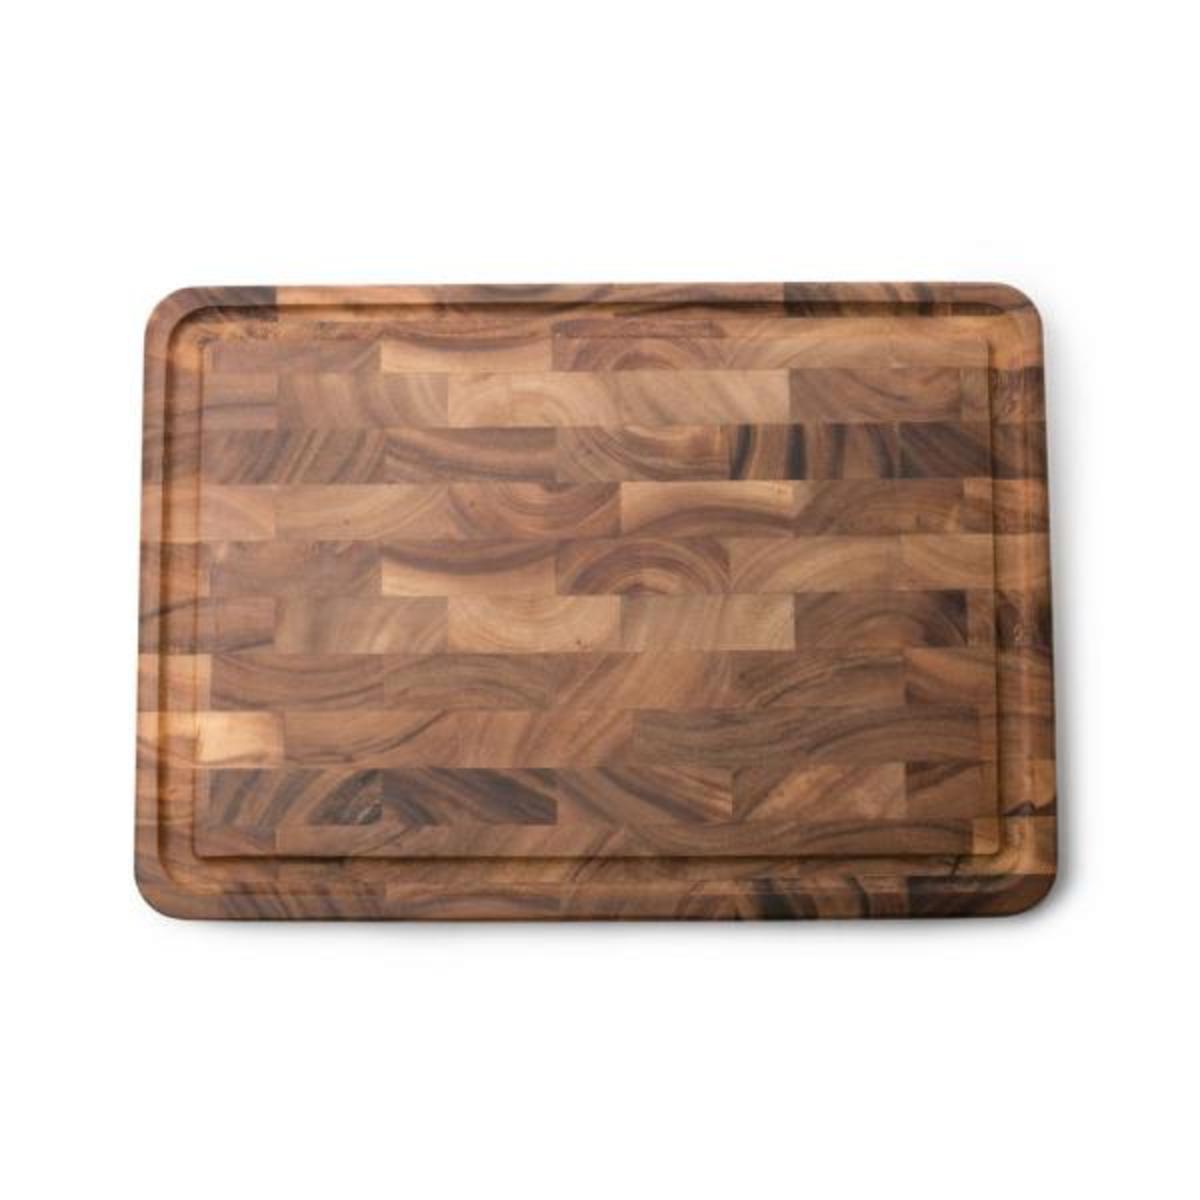 Ironwood Gourmet end-grain cutting board